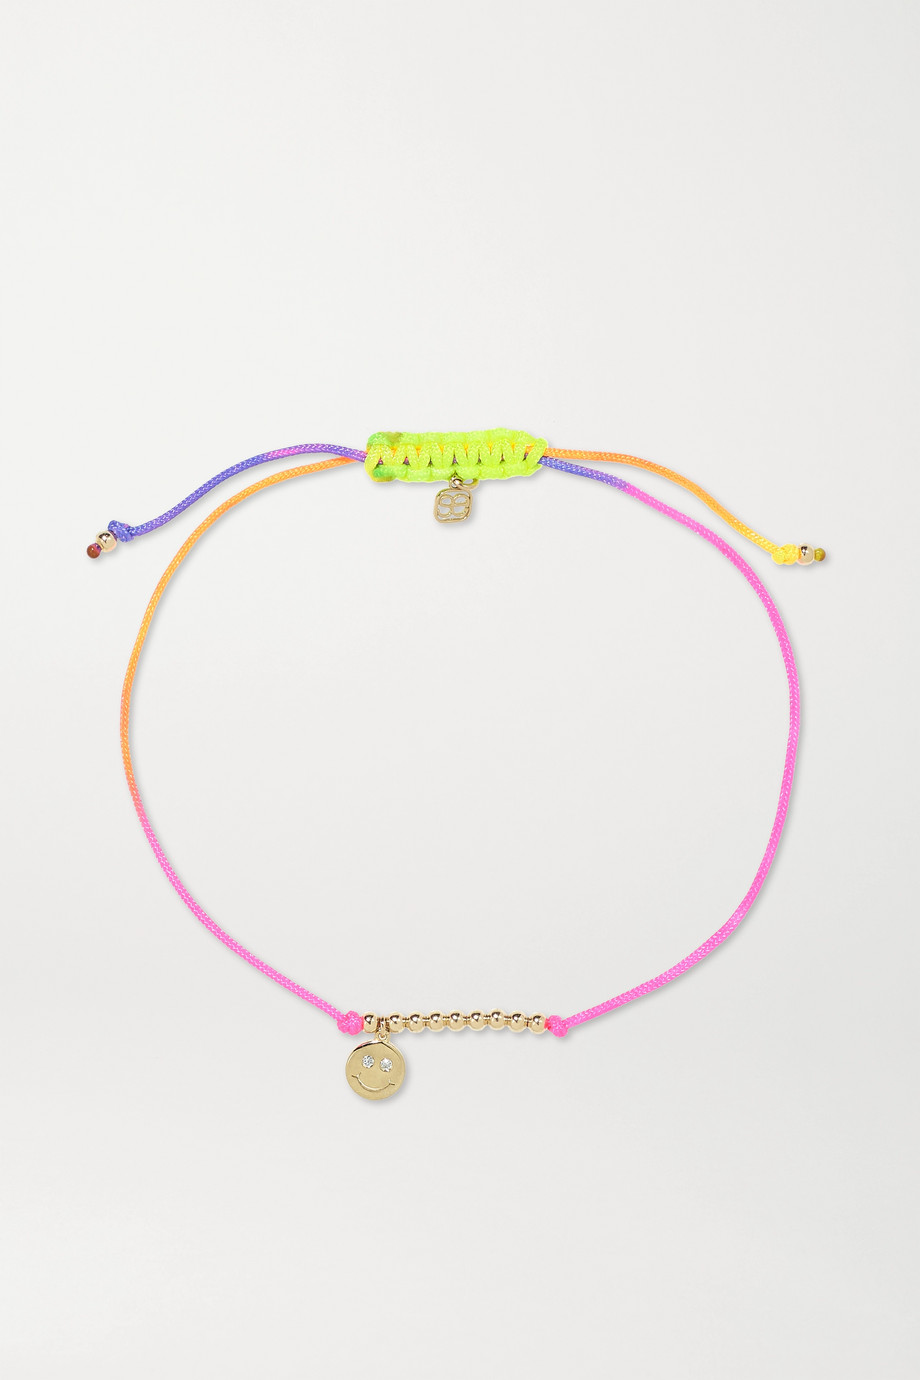 Sydney Evan Happy Face 14-karat gold, neon cord and diamond bracelet